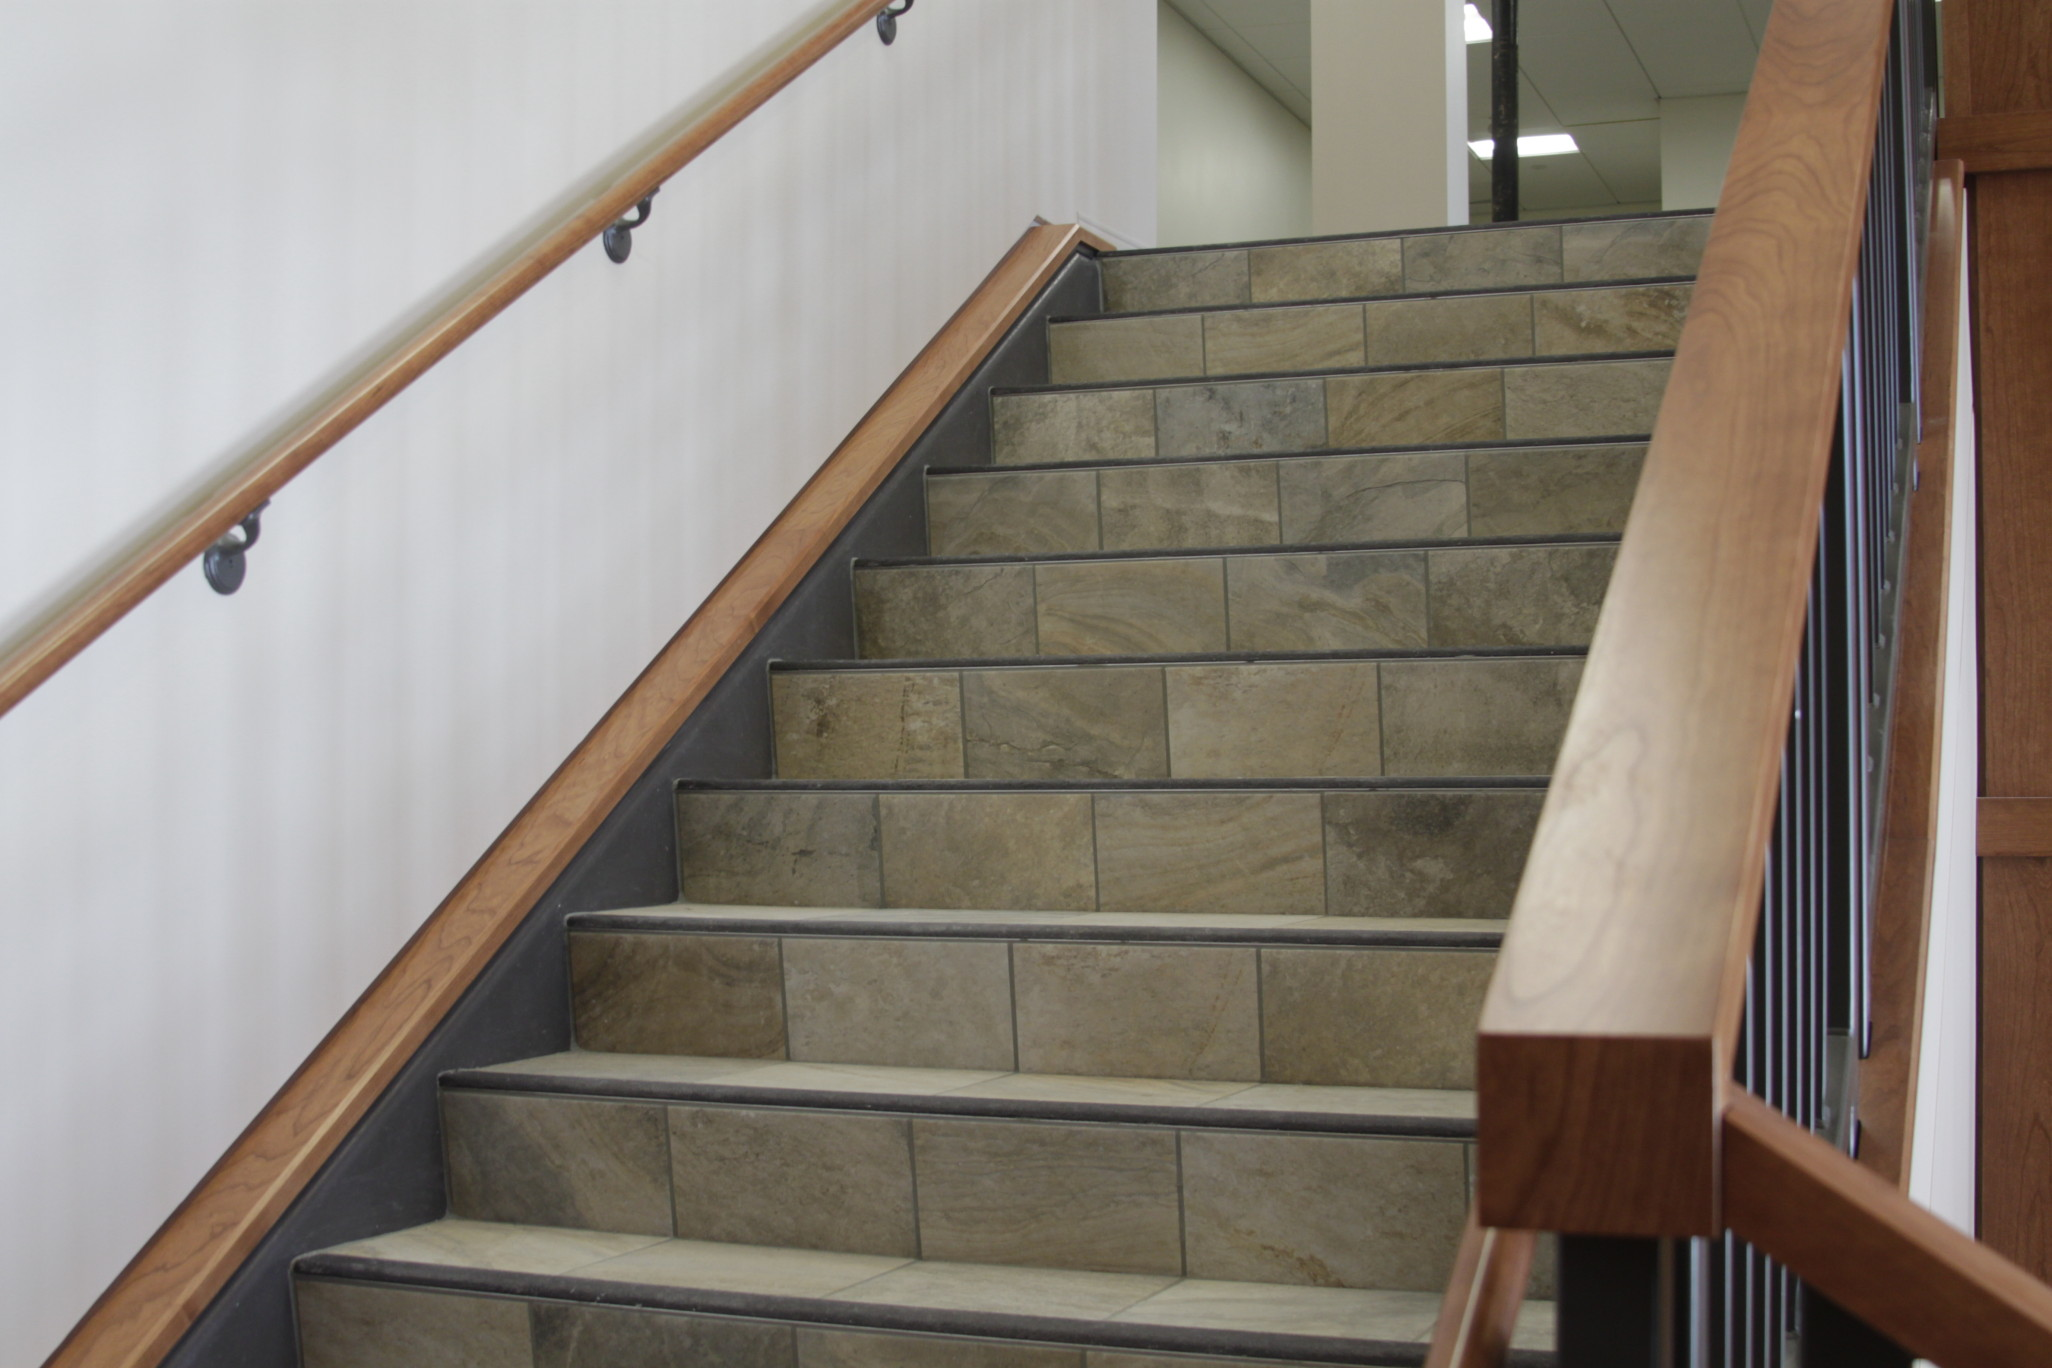 Laminate Tile Stone Look Flooring